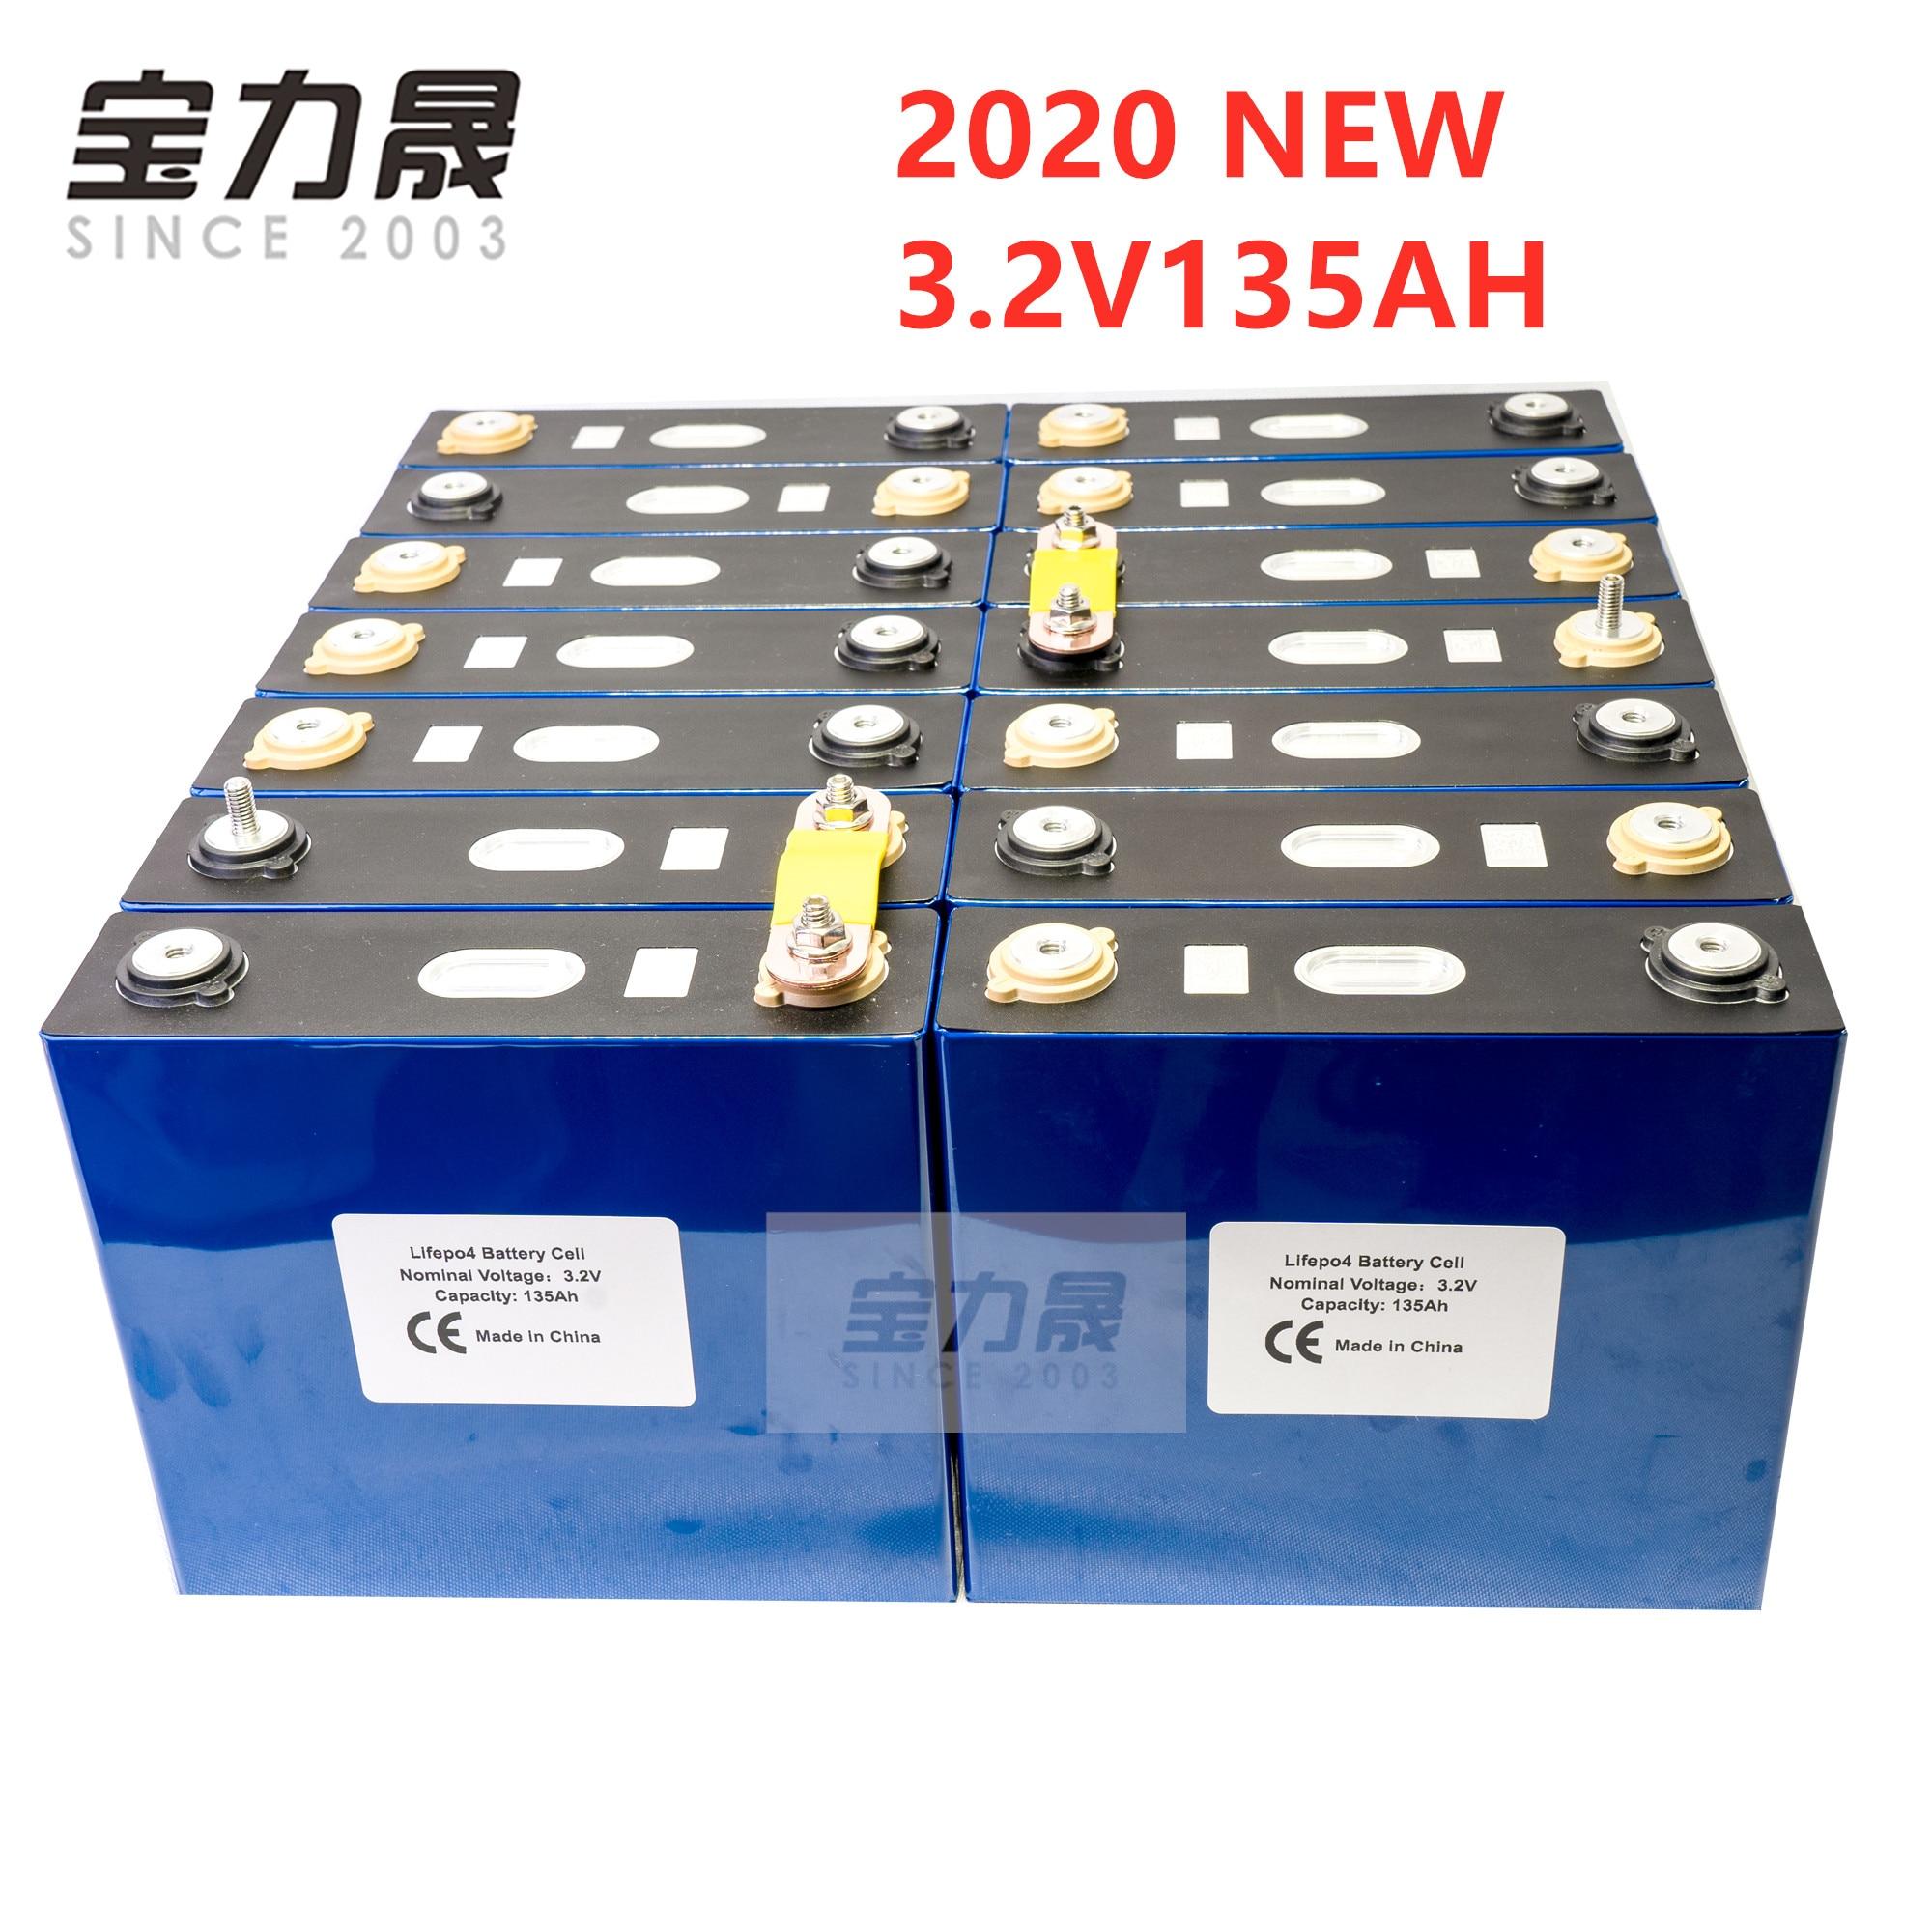 2020 NEW 32PCS 3.2V 135Ah Lithium Iron Phosphate Cell Lifepo4 Battery  Solar 96V135AH 48V120Ah Cells Not 150Ah EU US TAX FREE